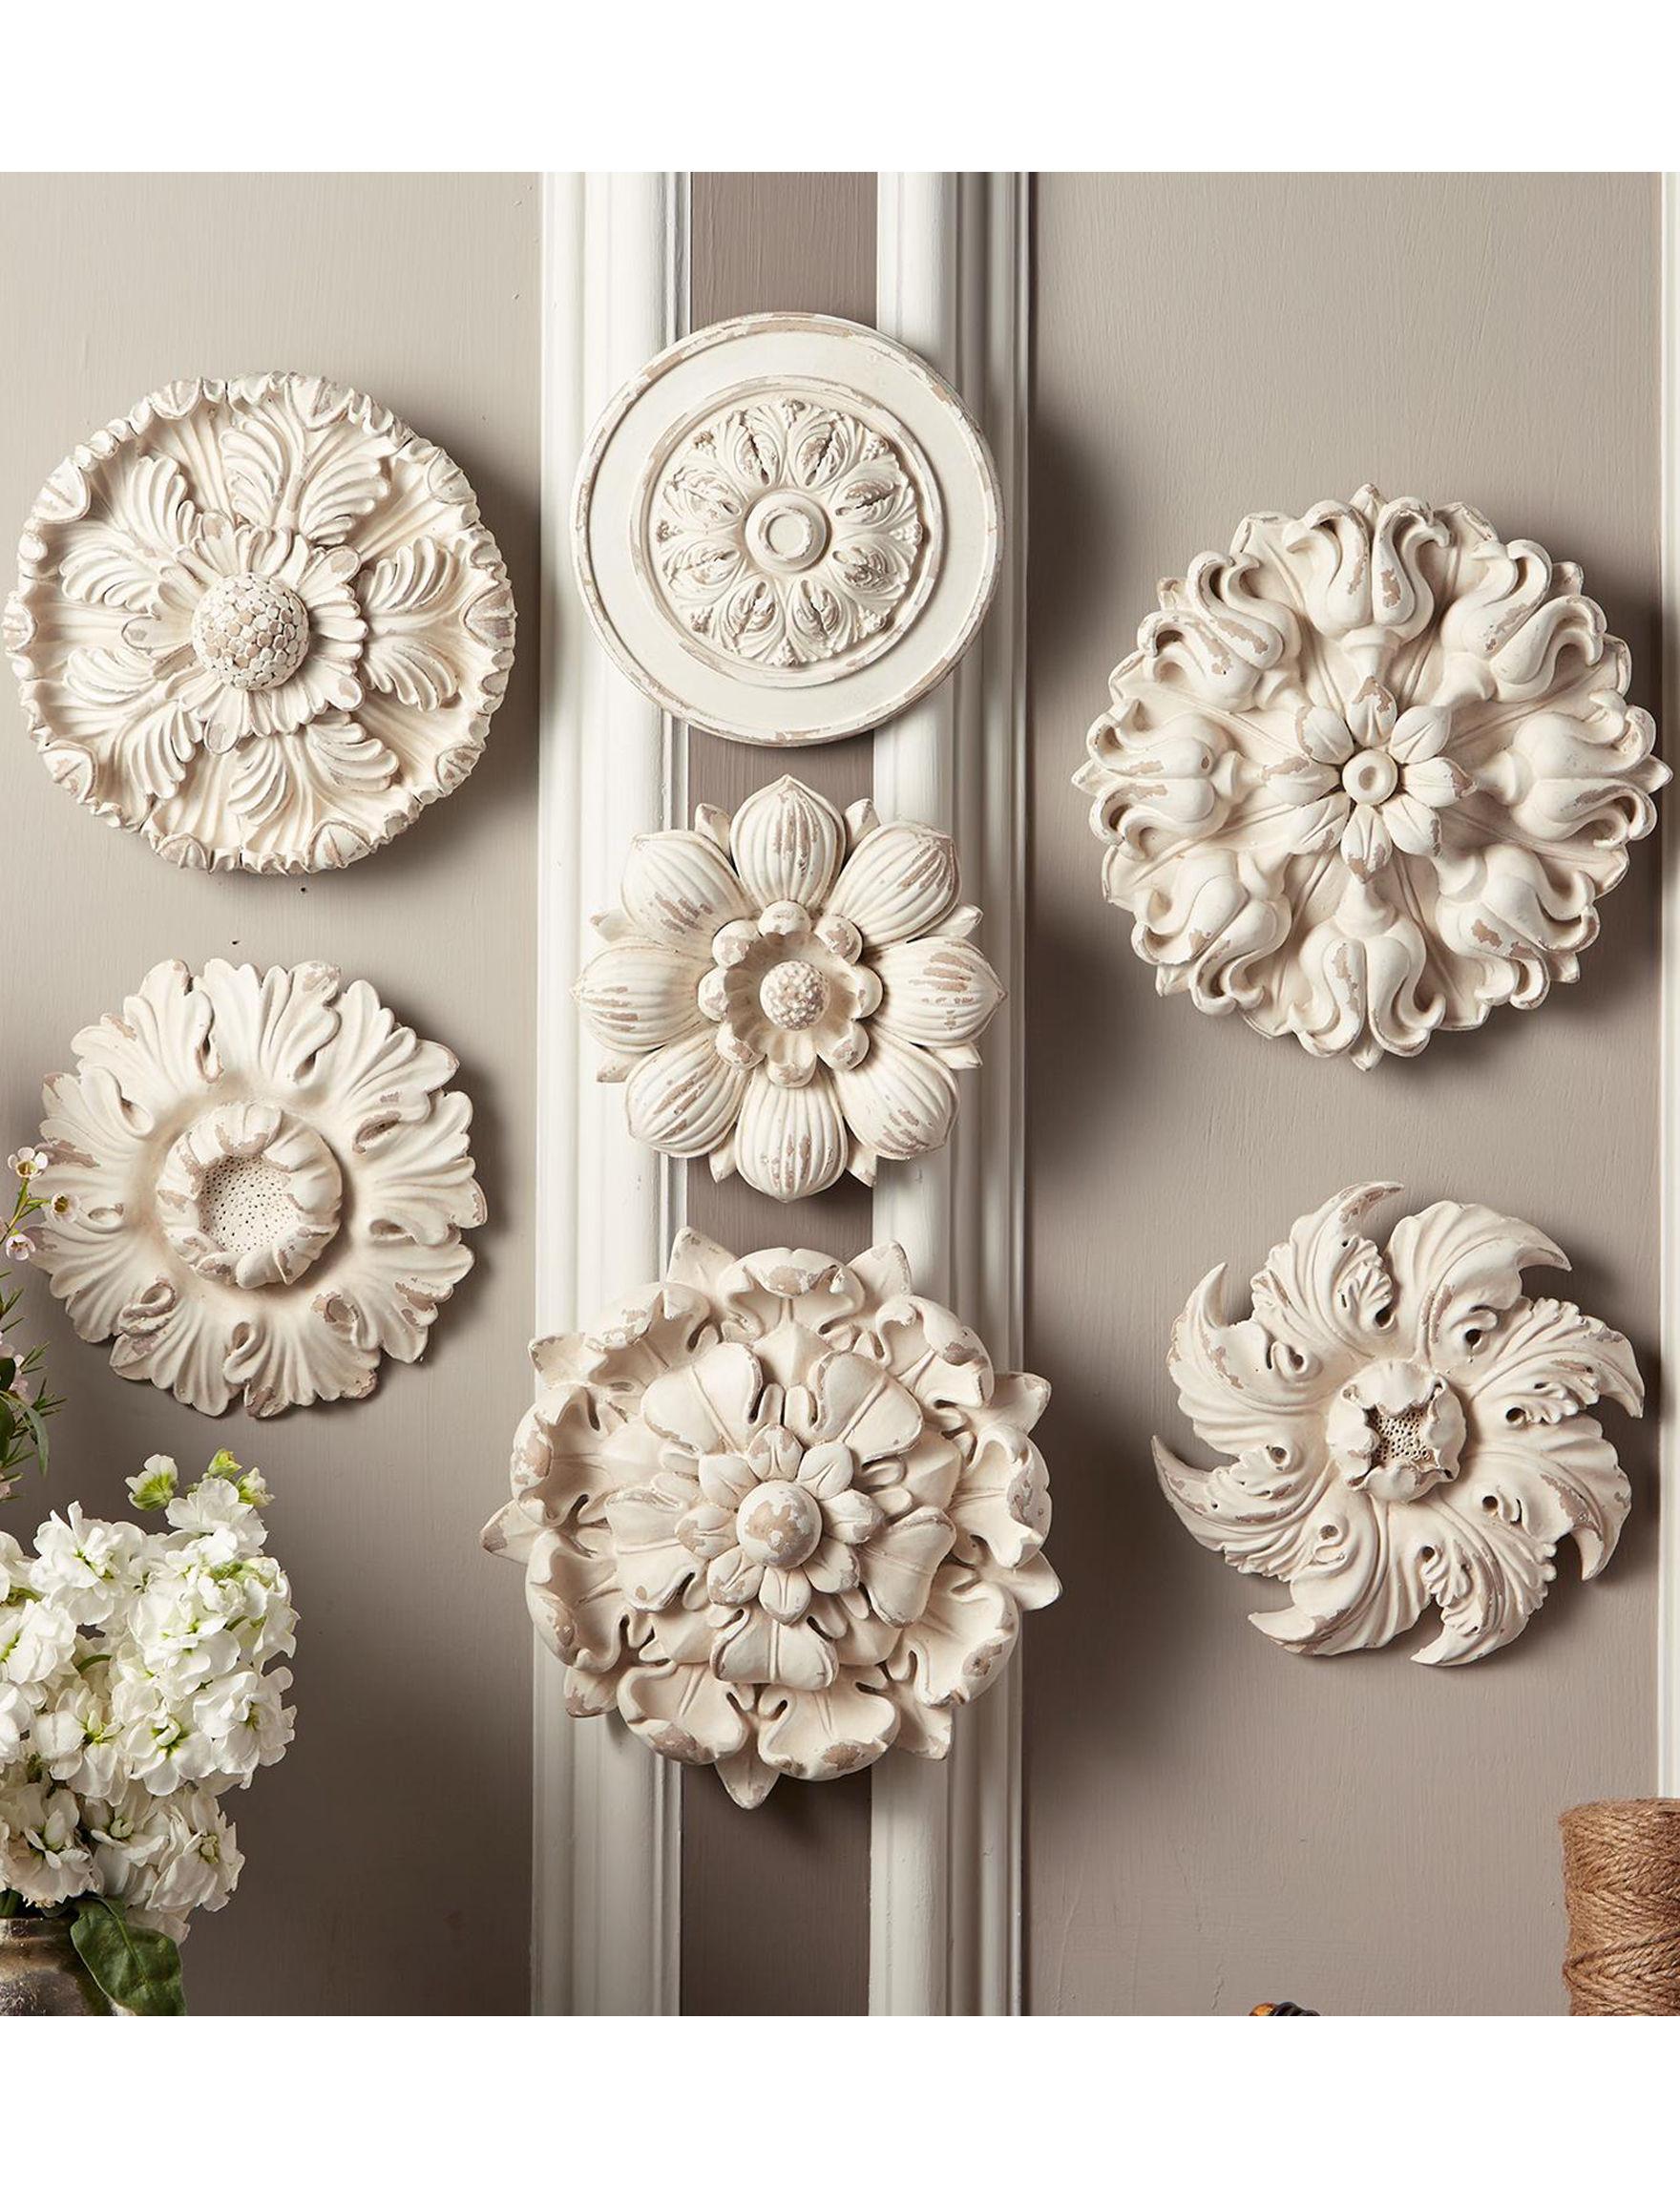 Two's Company White Decorative Objects Wall Art Wall Decor